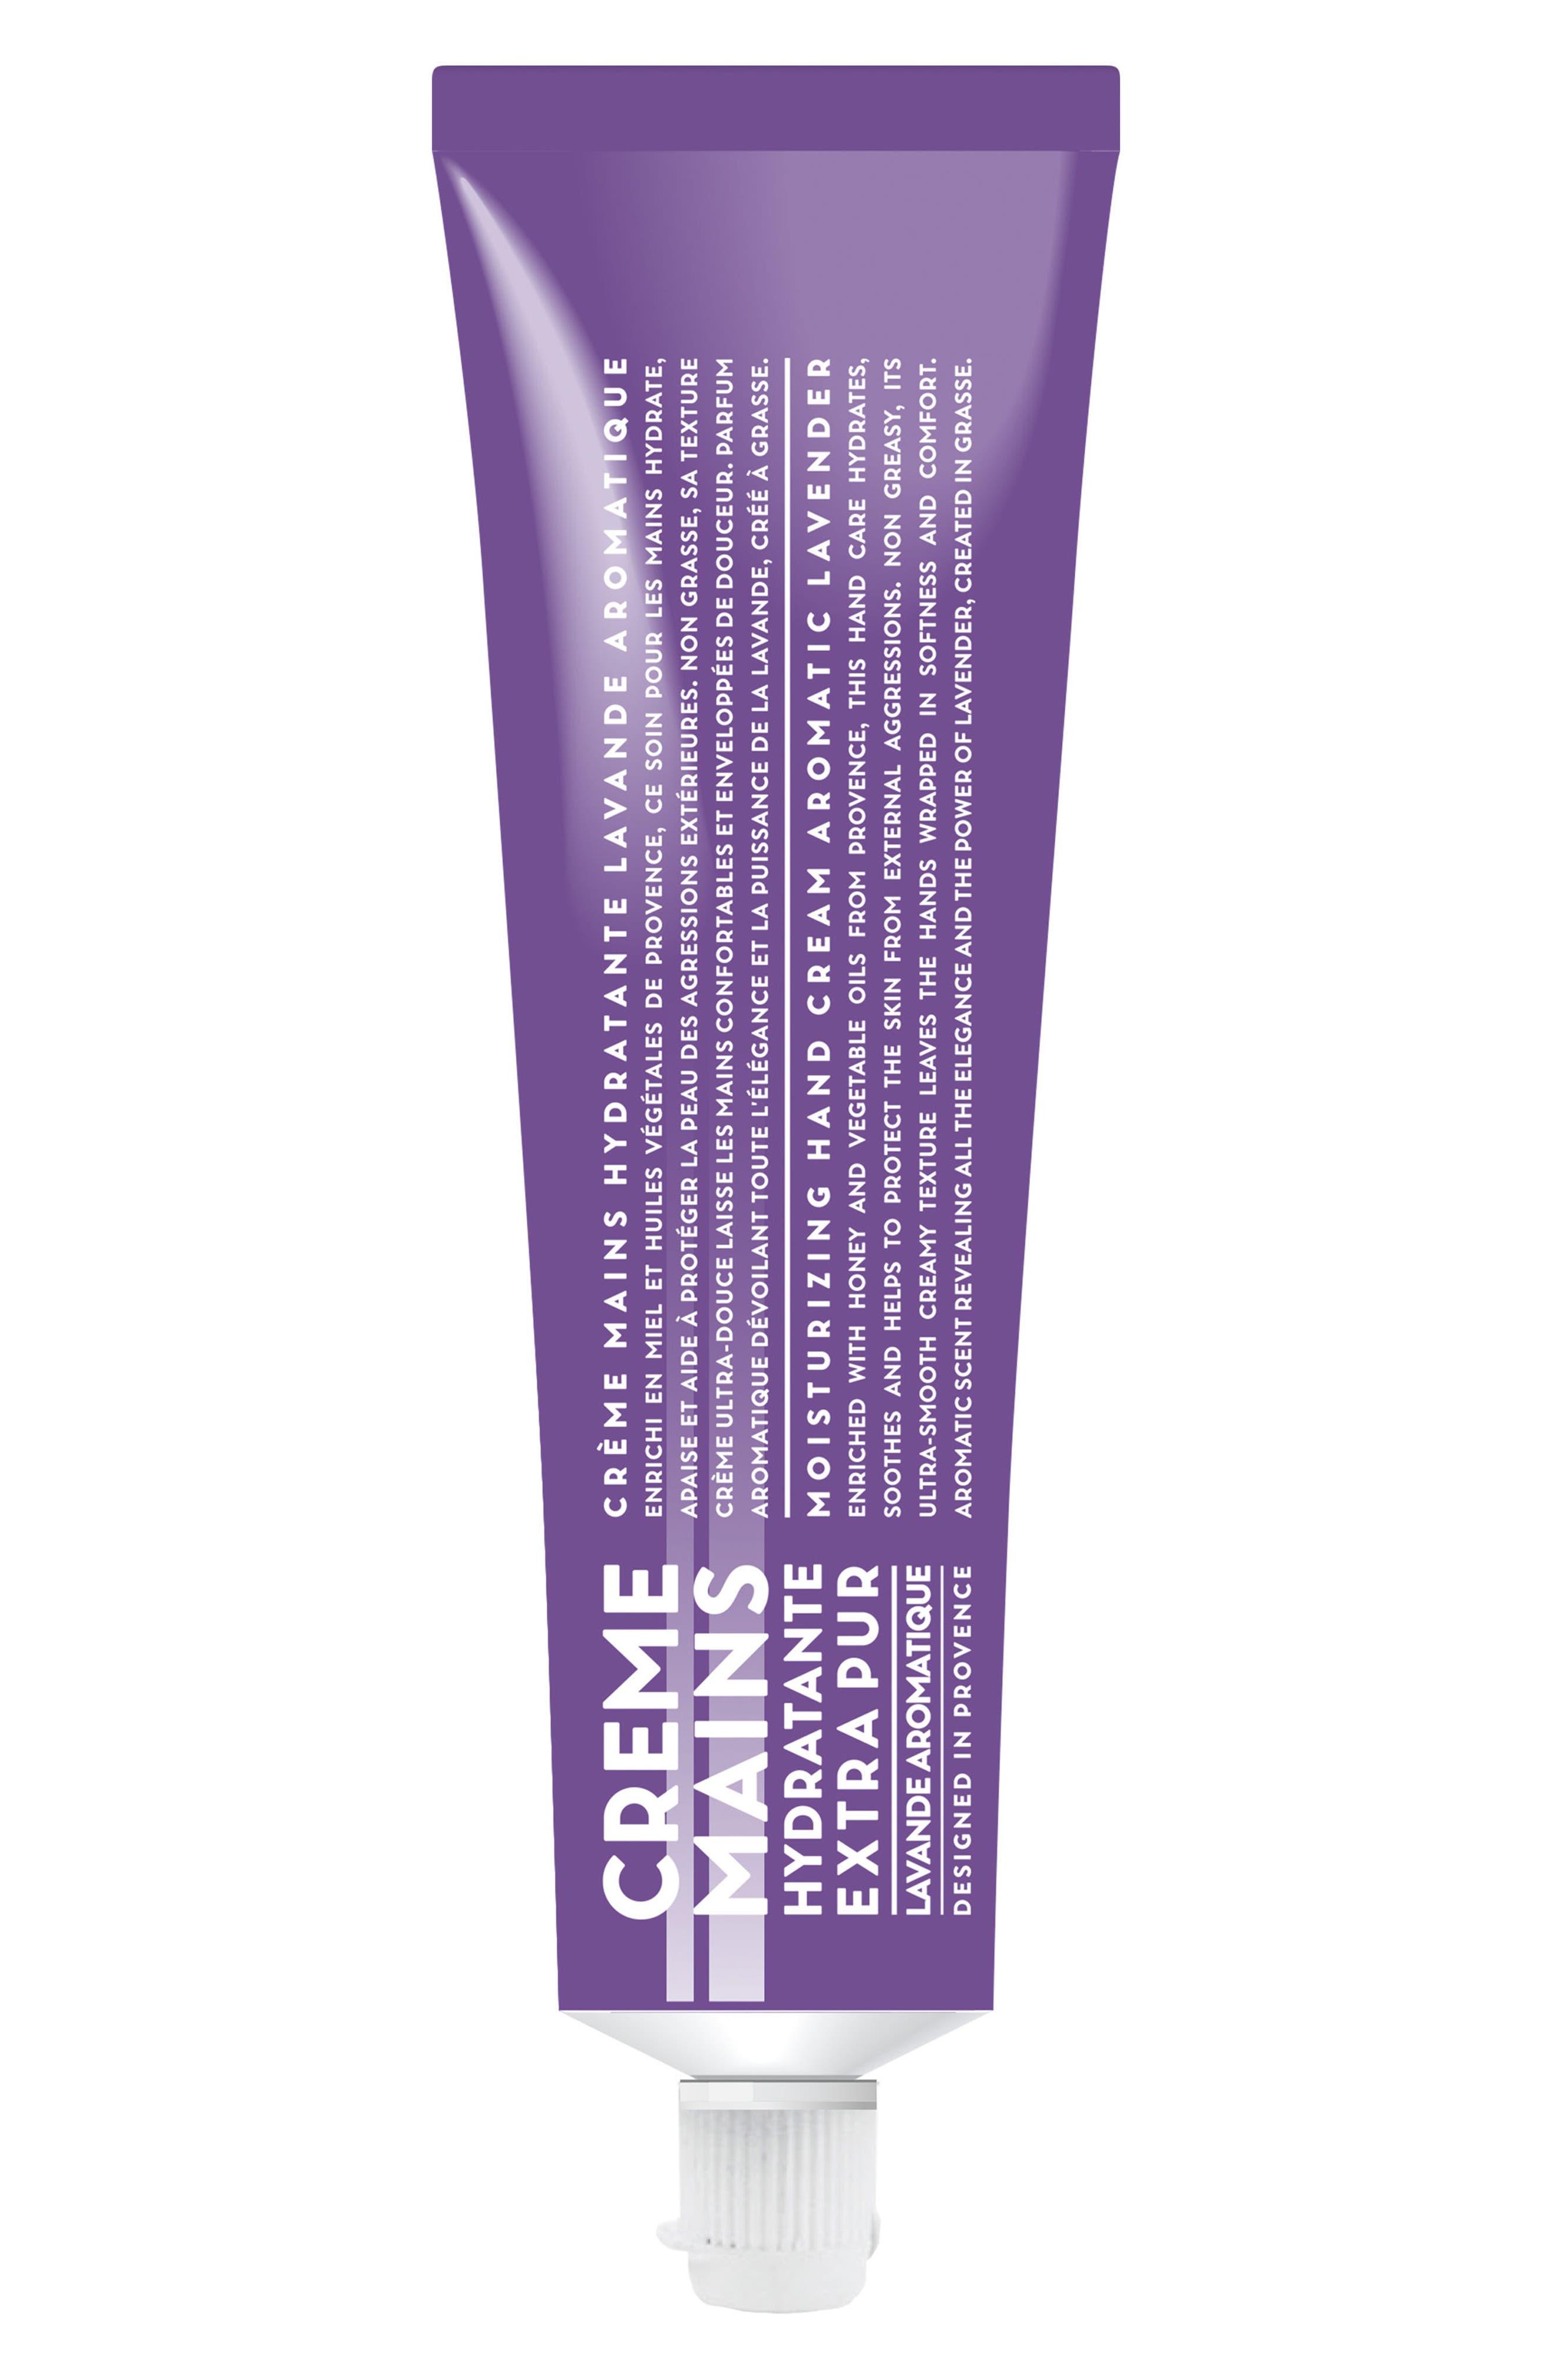 Aromatic Lavender Moisturizing Hand Cream,                             Main thumbnail 1, color,                             No Color